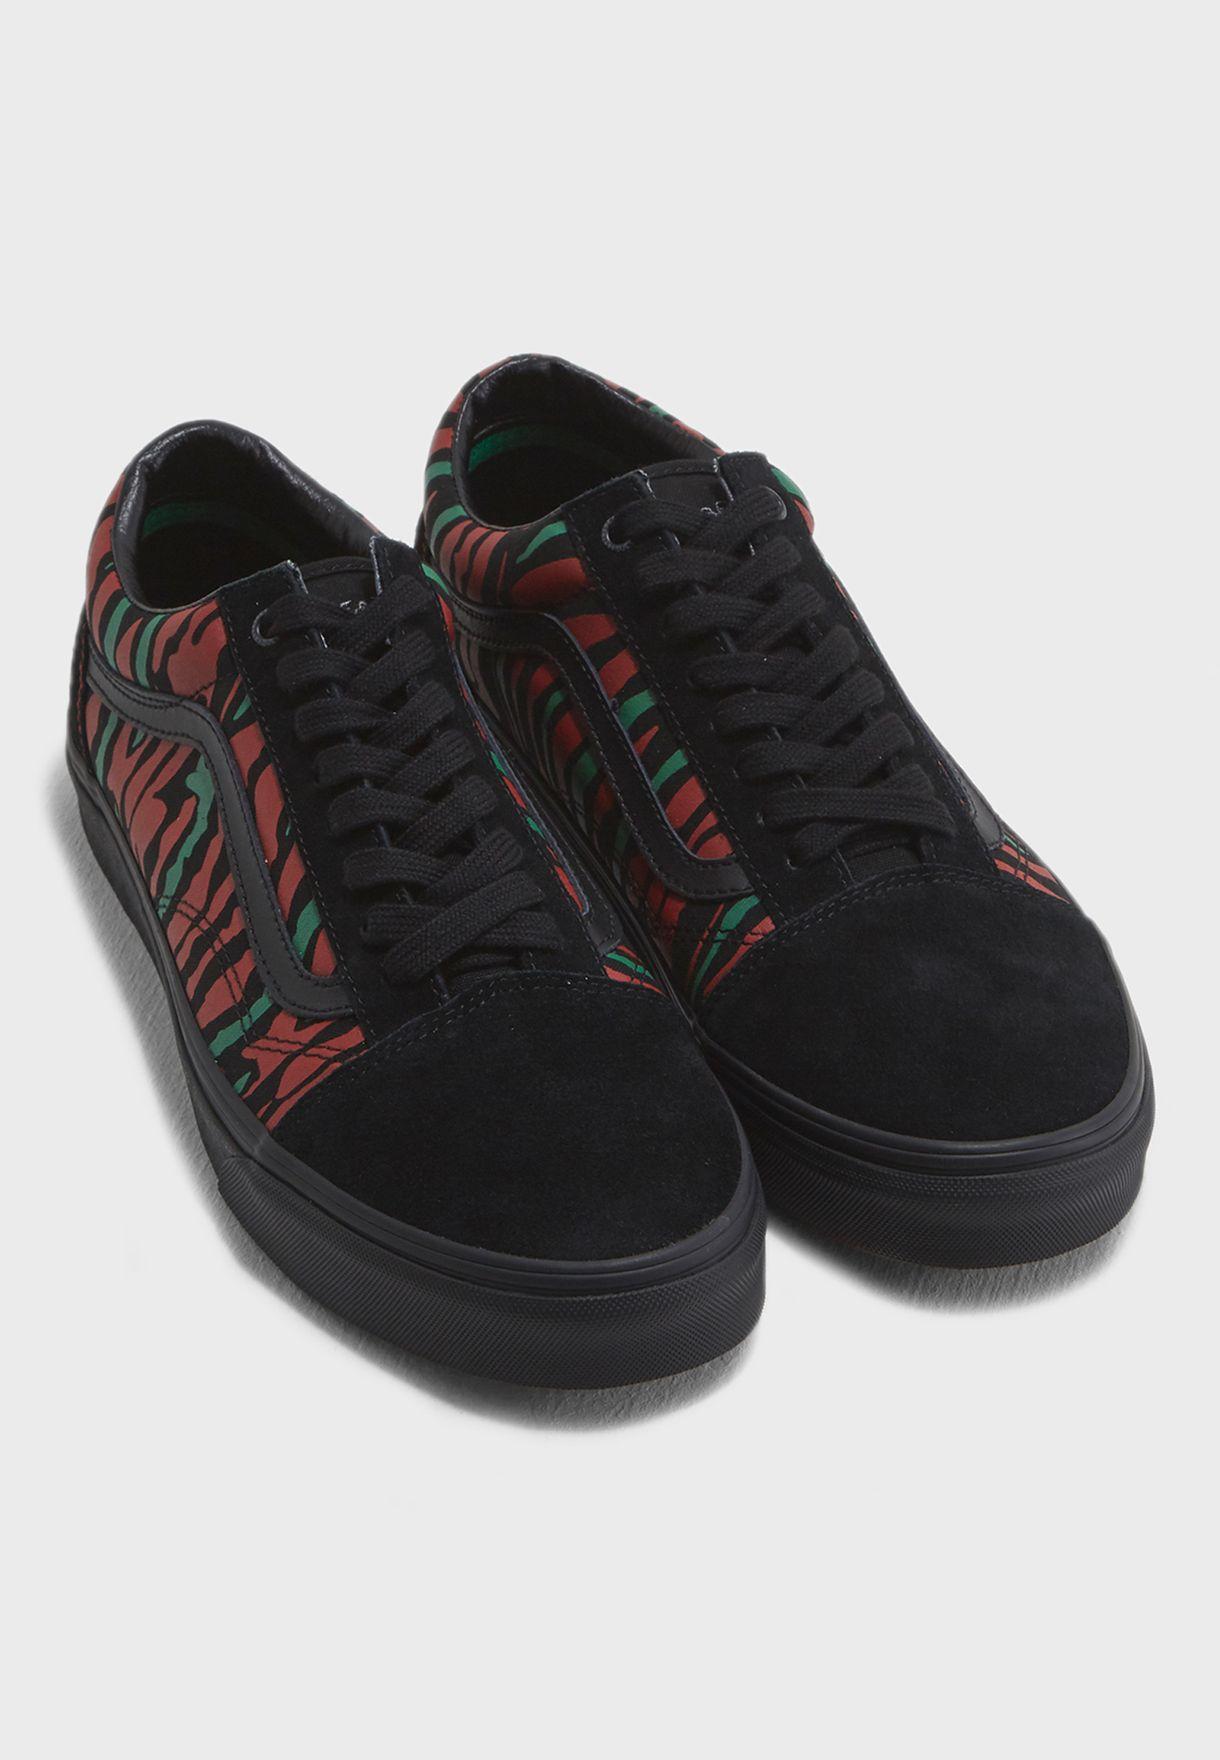 Shop Vans prints ATCQ Old Skool 8G1Q4B for Men in UAE - VA088SH50YBD 7359a2b5c0422